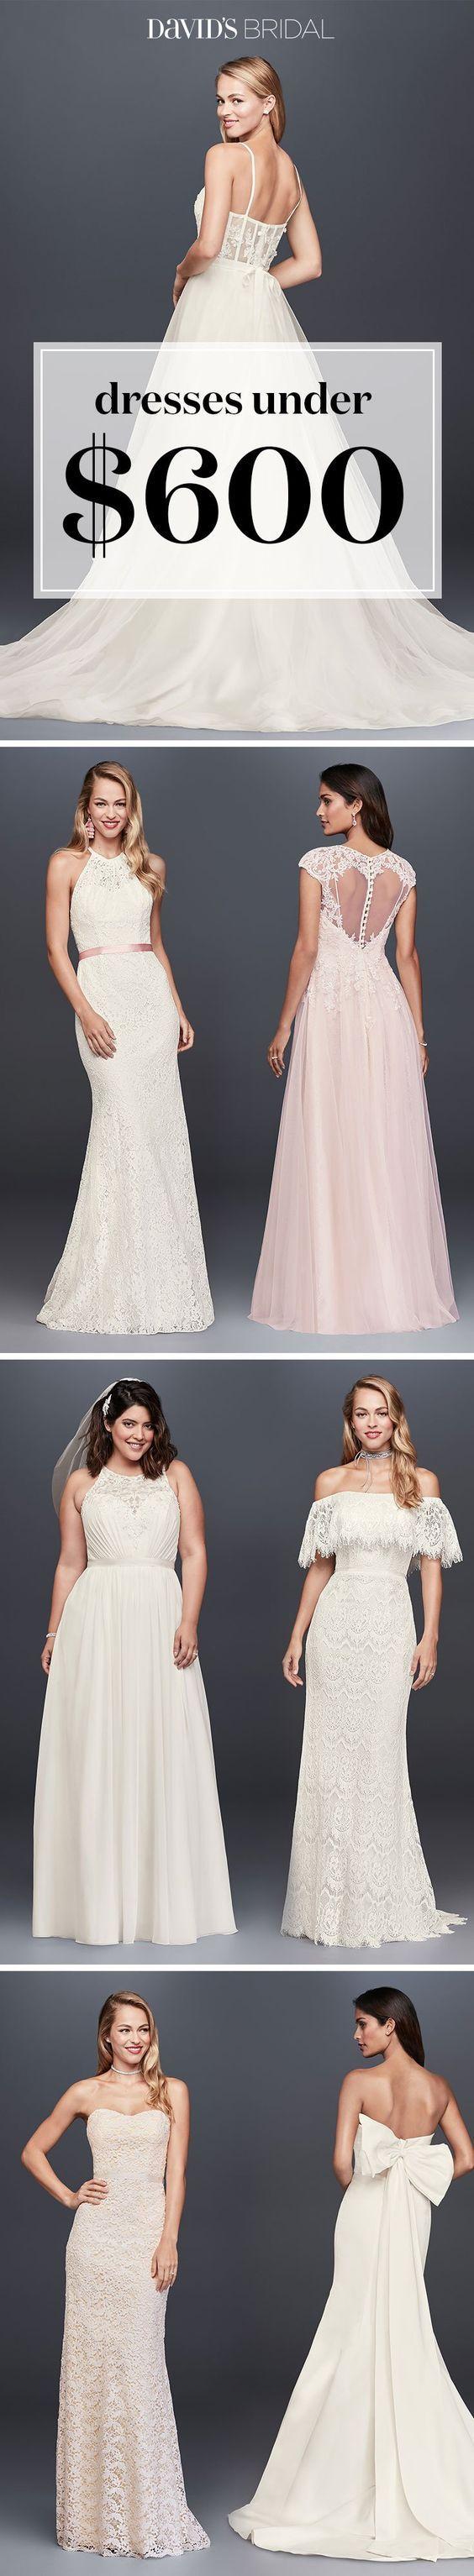 Rent wedding dress davids bridal   best wedding gowns images on Pinterest